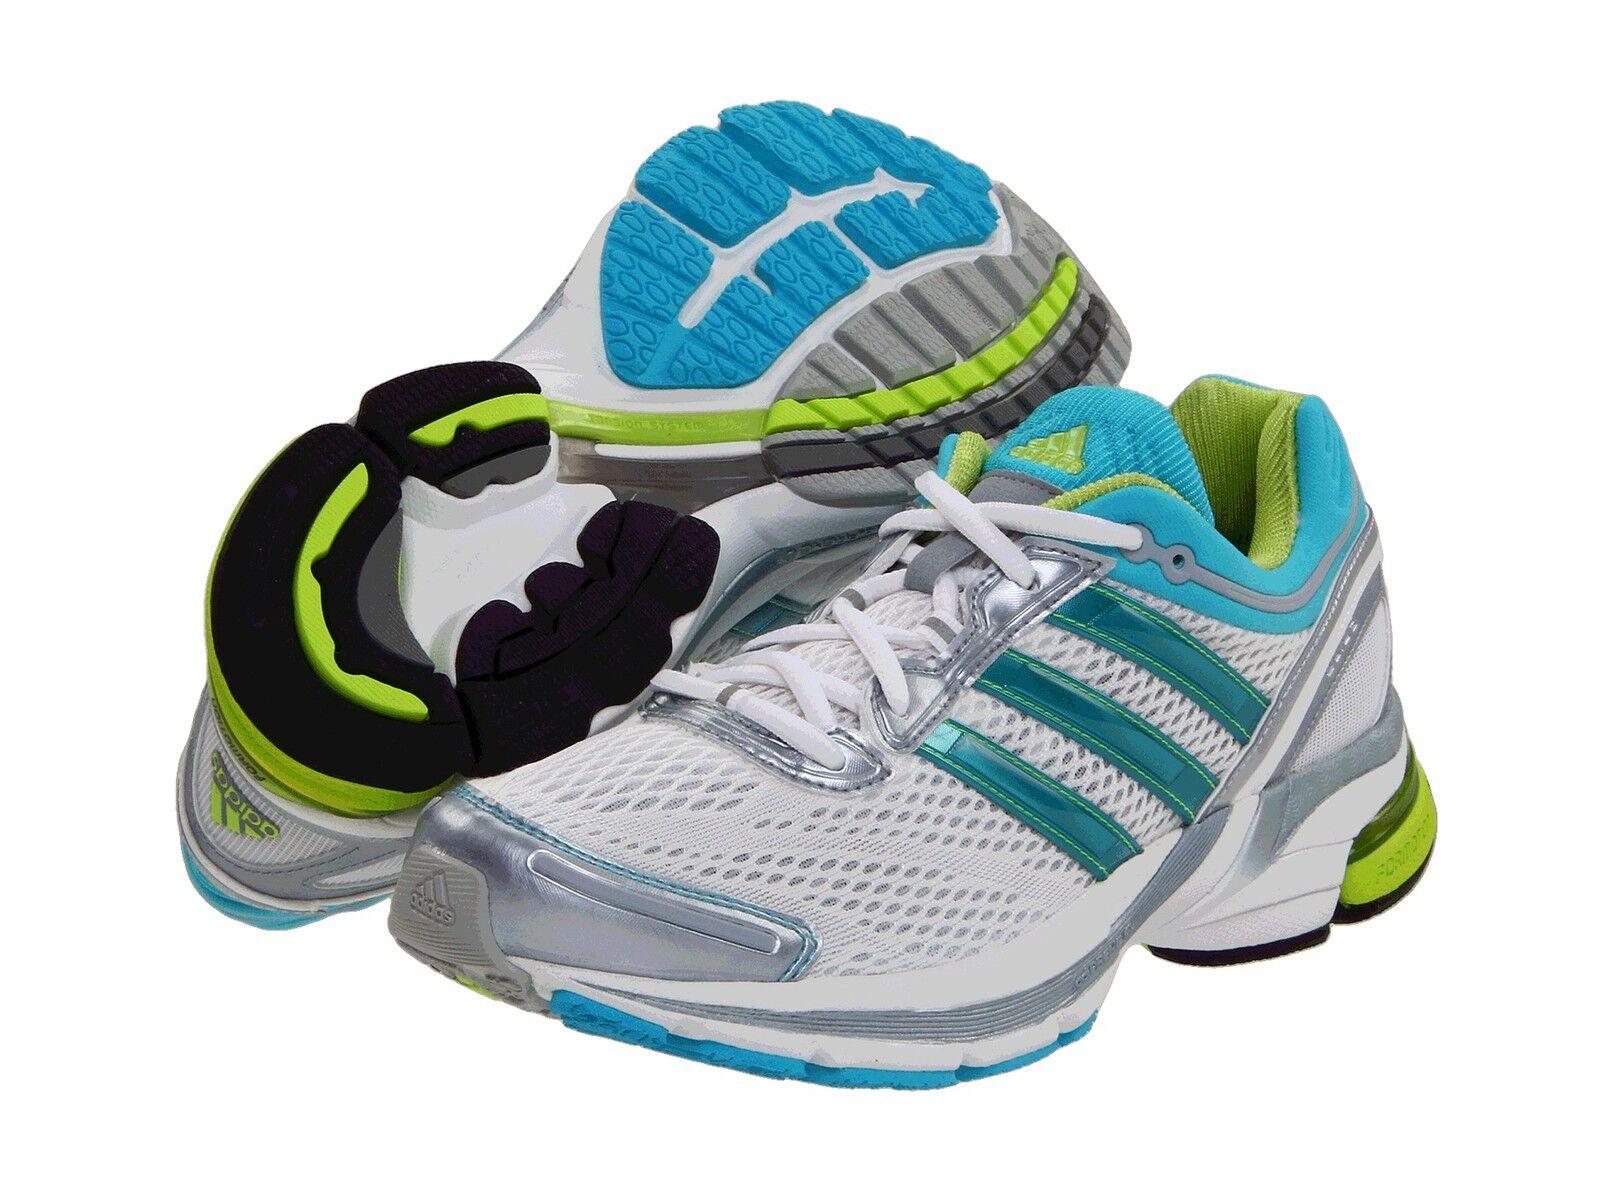 ADIDAS SUPERNOVA GLIDE 3 W WOMEN'S RUNNING SNEAKERS SIZE 12.5 BRAND NEW